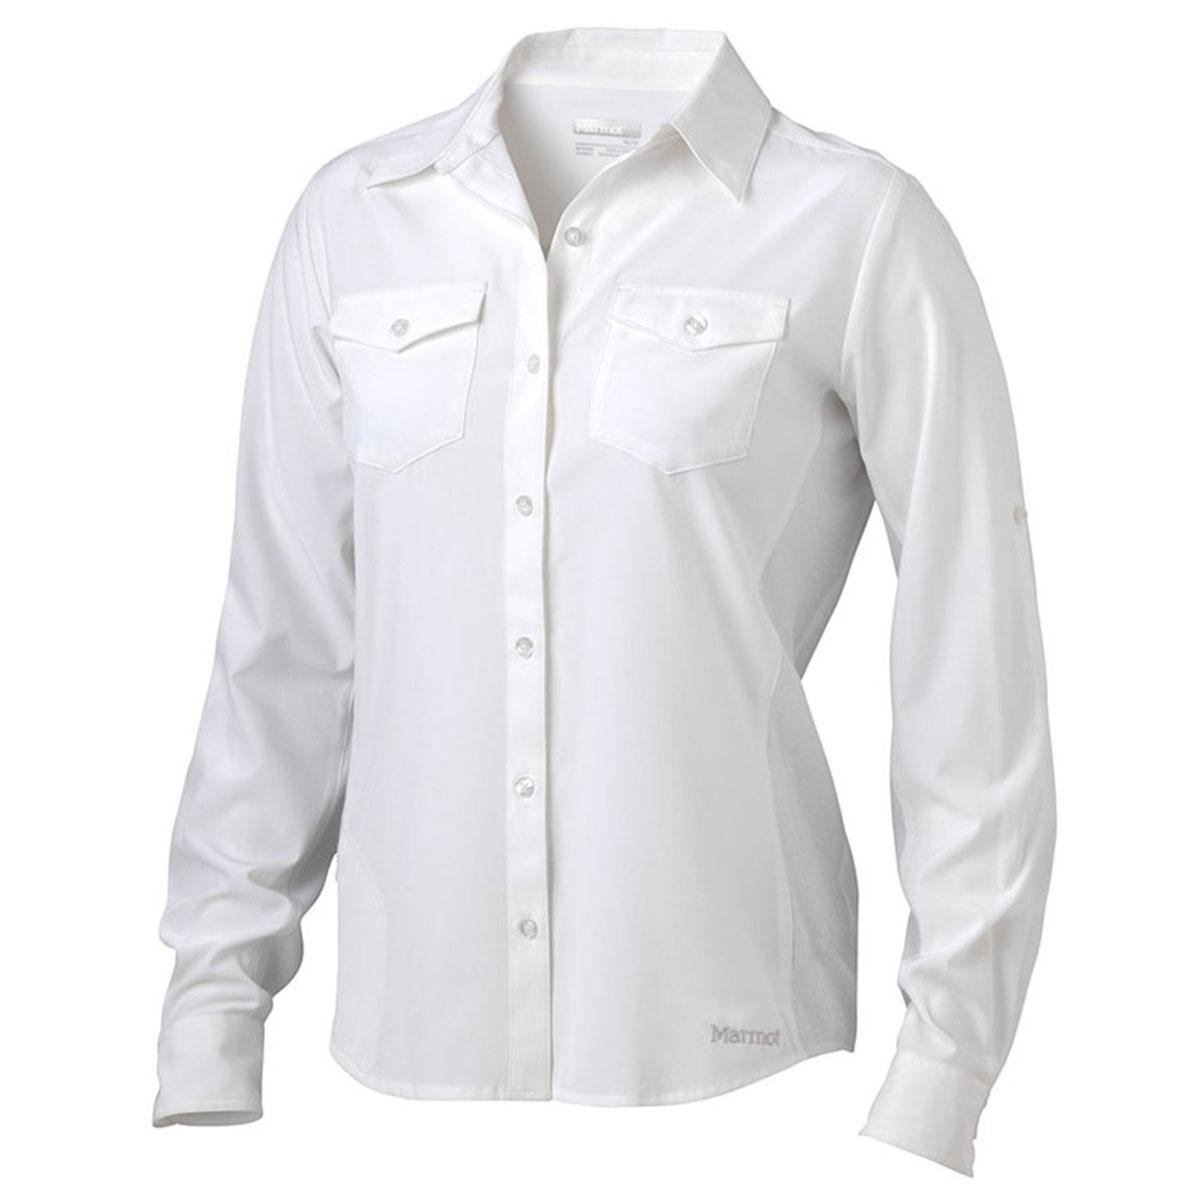 Marmot Women's Annika Long-Sleeve Shirt - White, XL